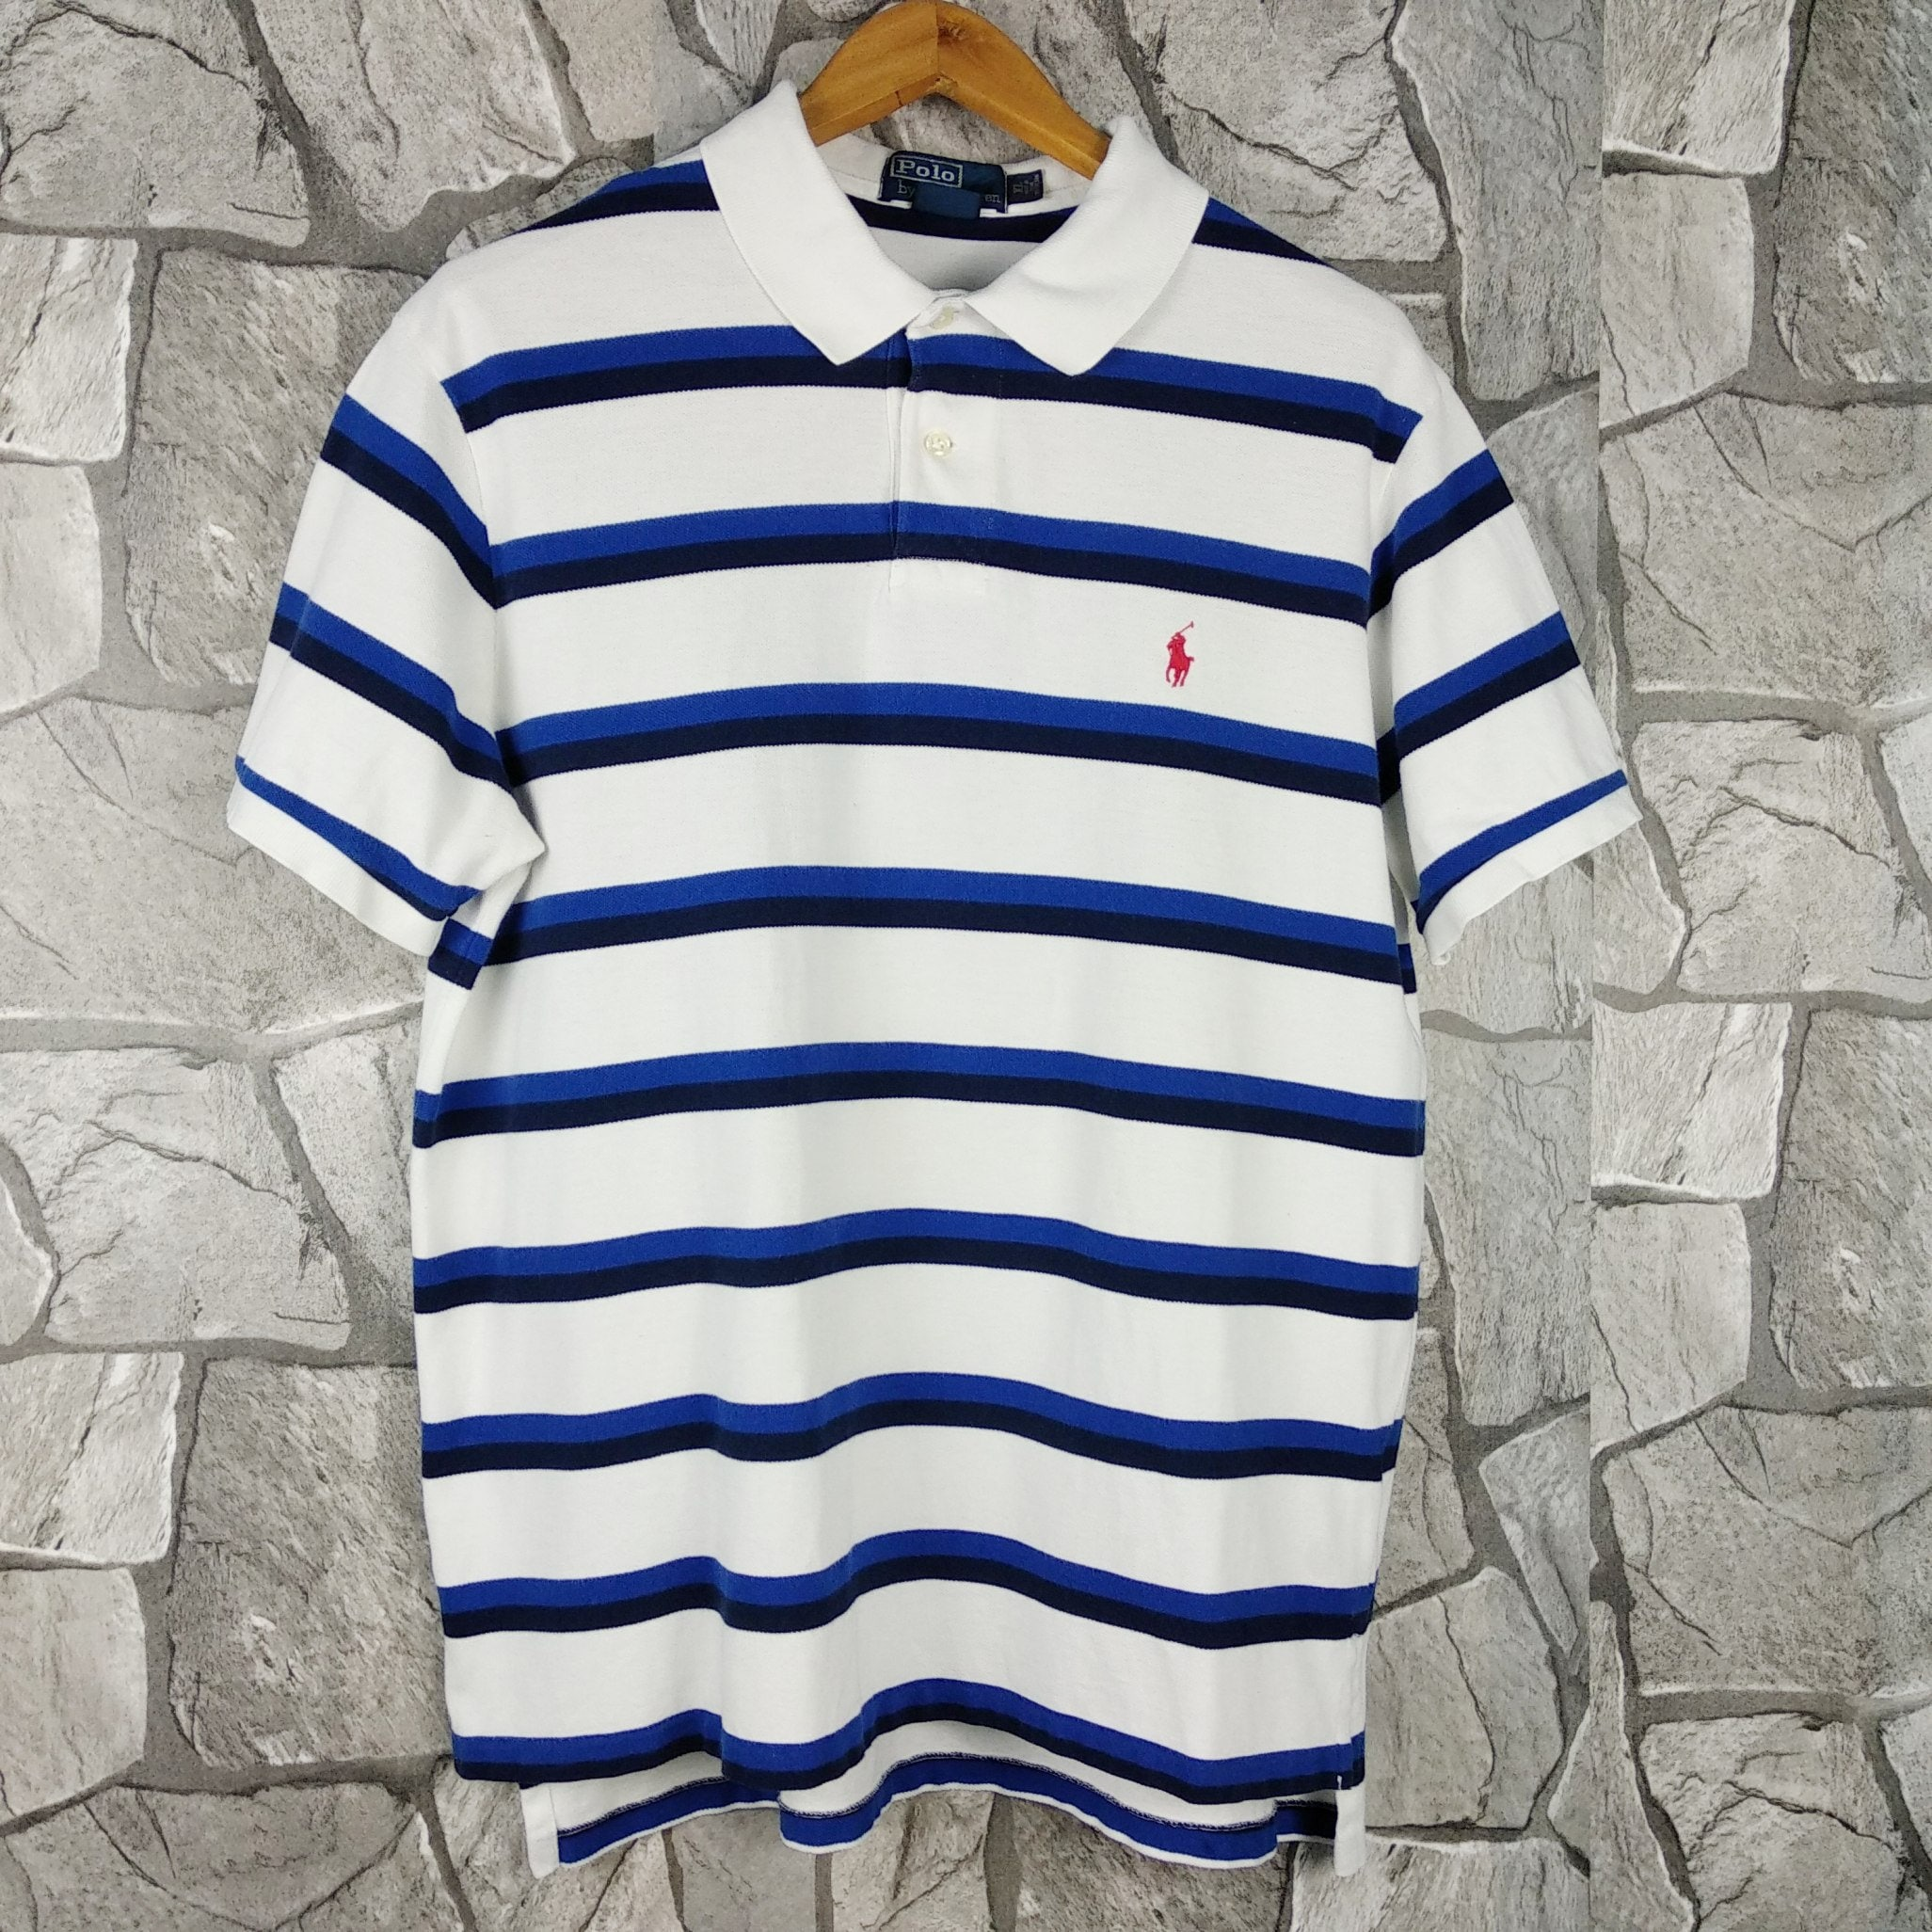 POLO Ralph Lauren Polos Polo Vintage Polo Polos Ralph Lauren Pony Rugby T- Shirt 74ea32 57ffc2ae4a2